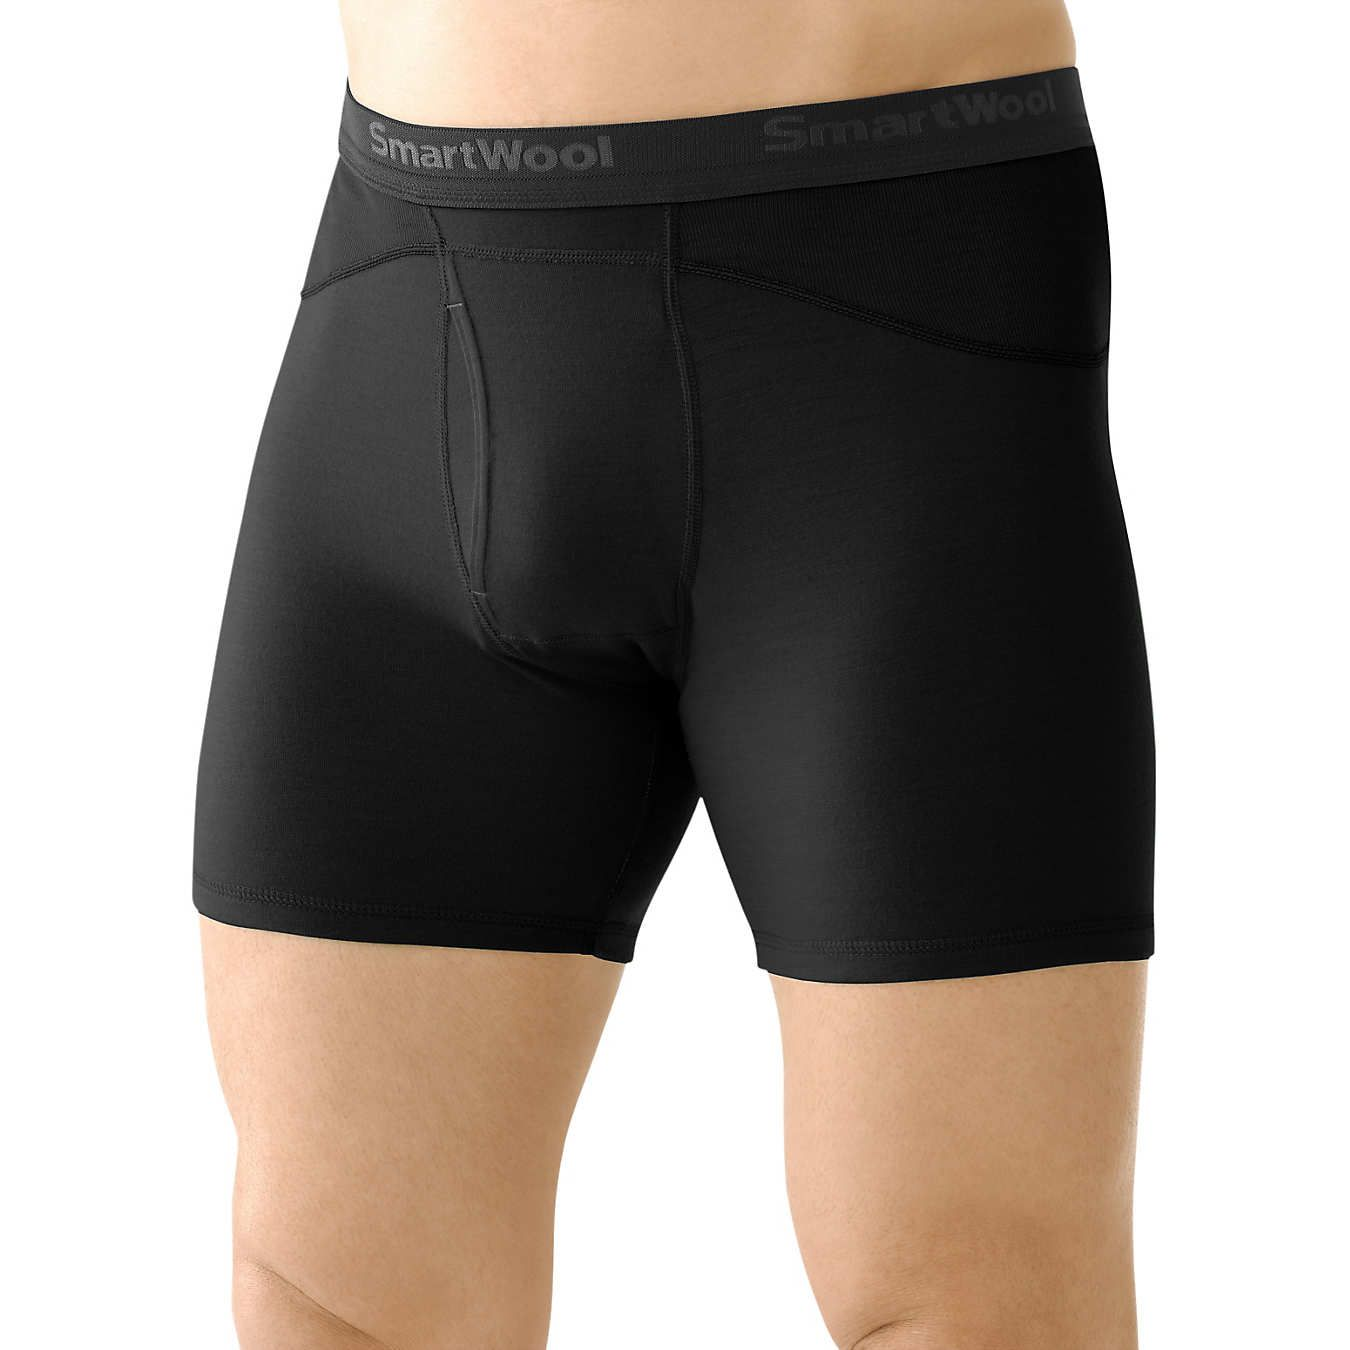 4801f9354b1f Men's Merino Wool Underwear | Smartwool® | Gear | Camping activities ...